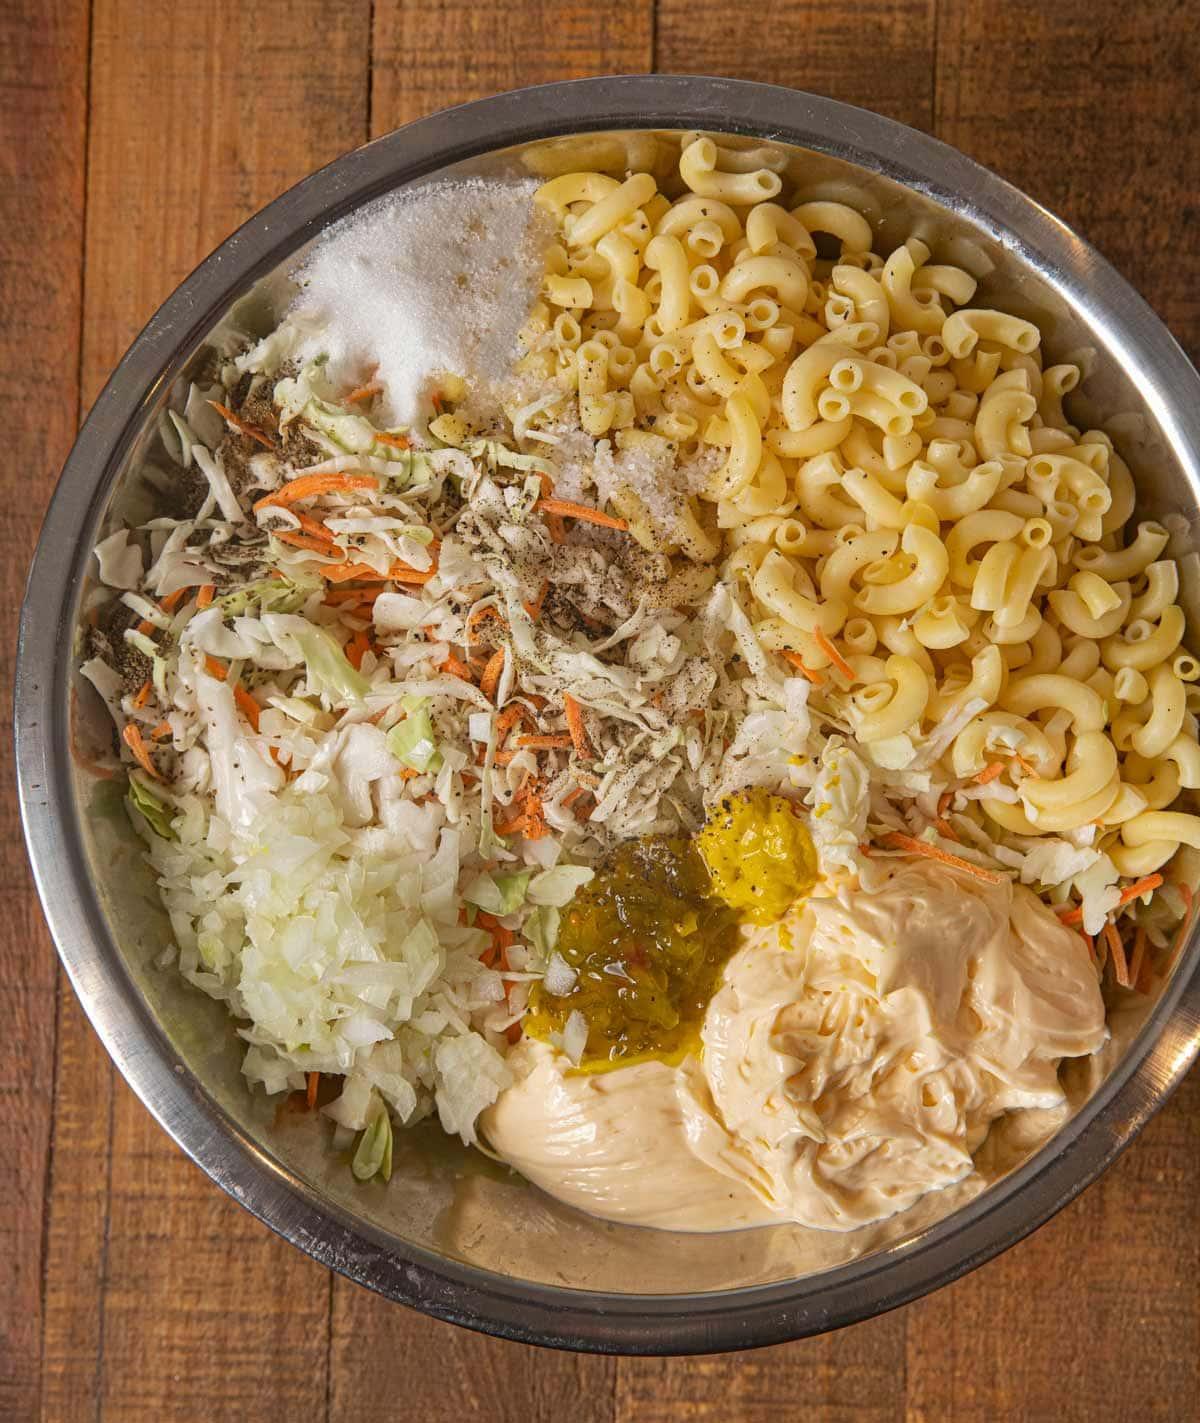 Coleslaw Macaroni Salad ingredients in bowl